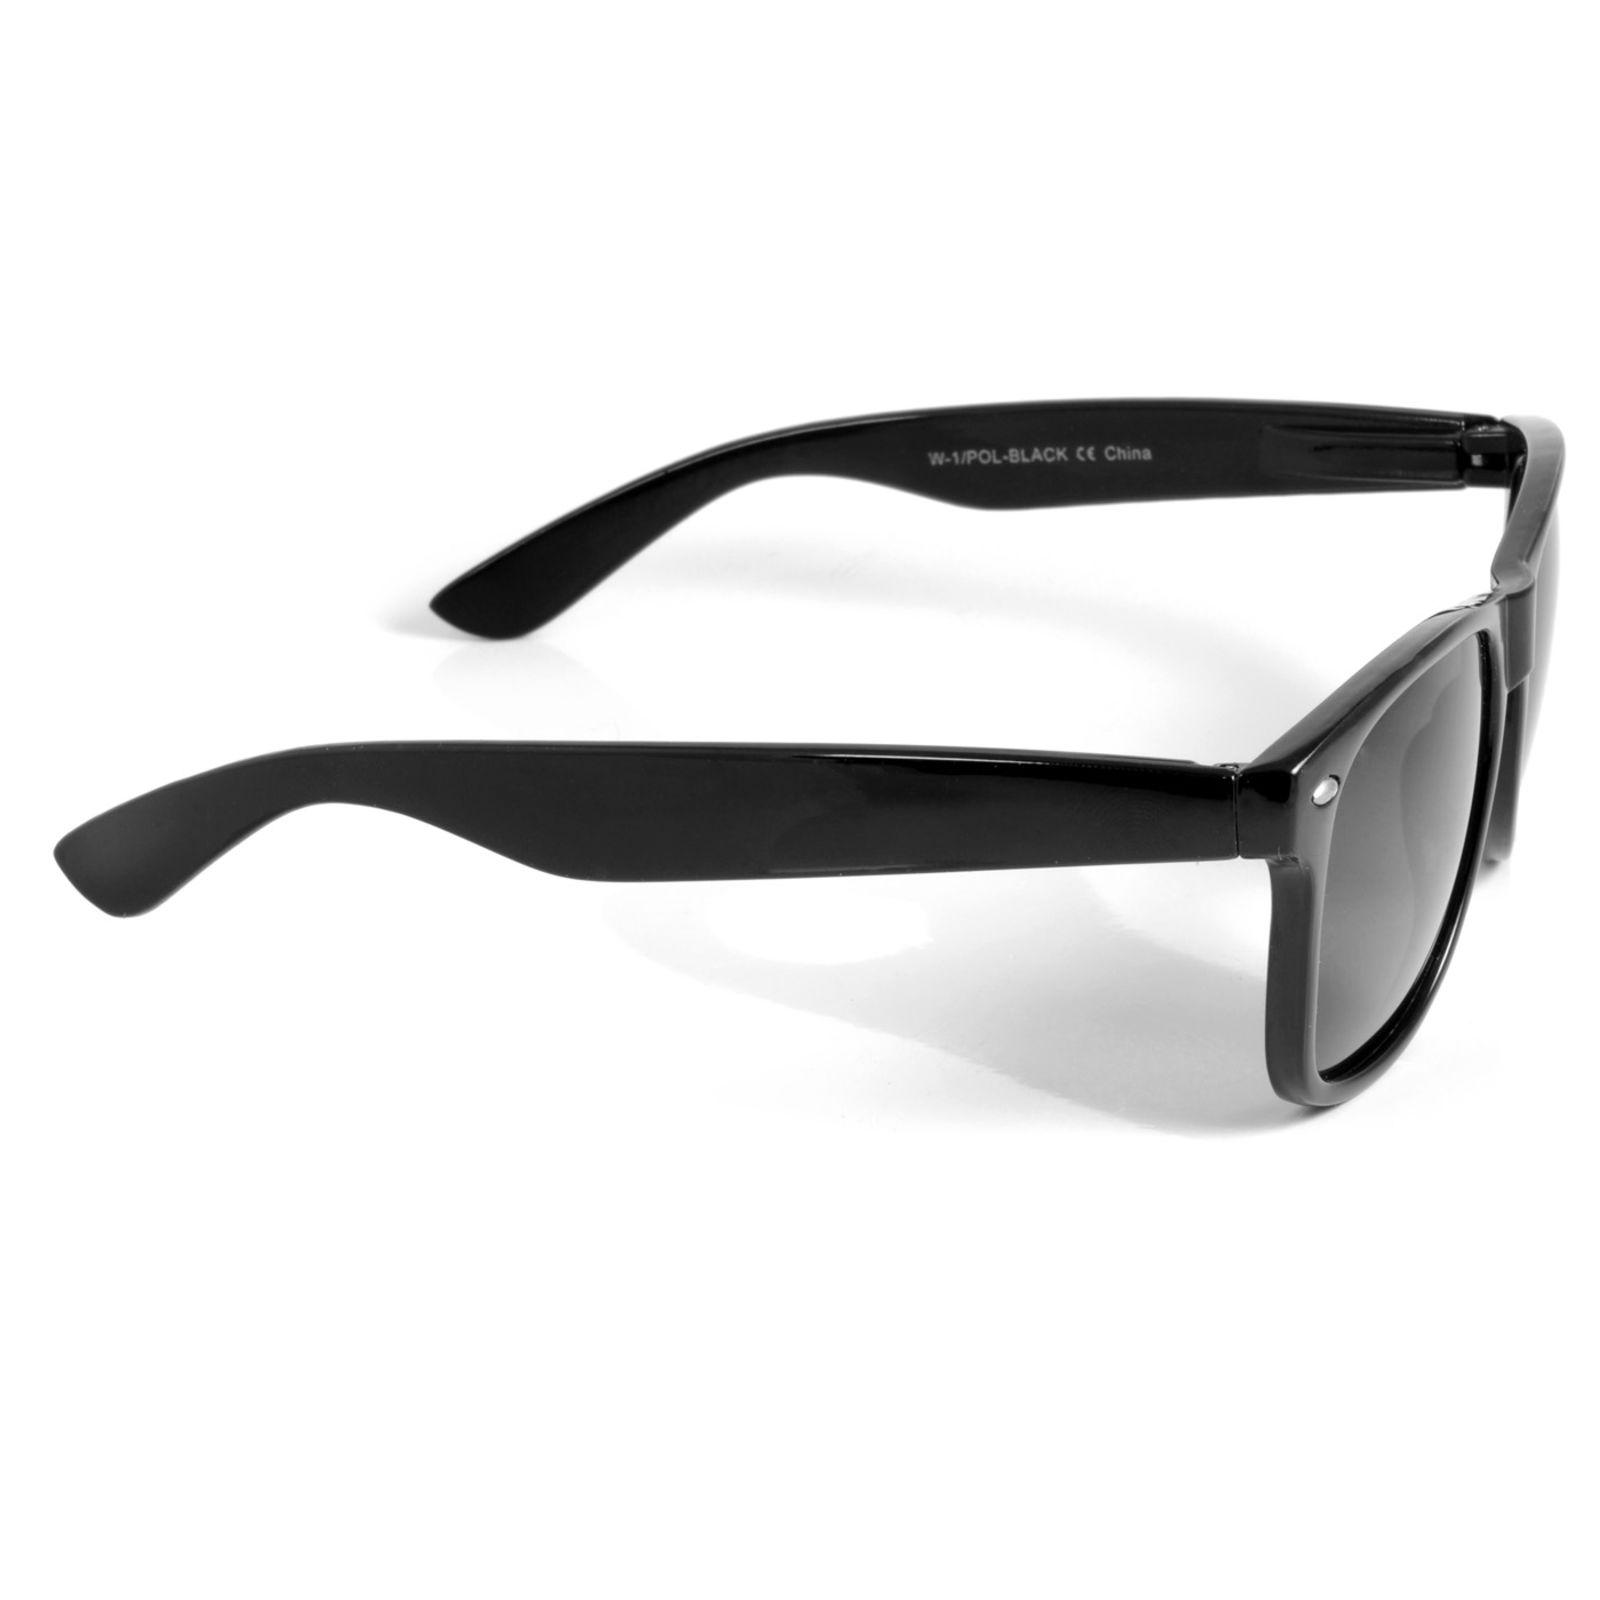 98eca4350c6f1a Zwarte Retro gepolariseerde Zonnebril